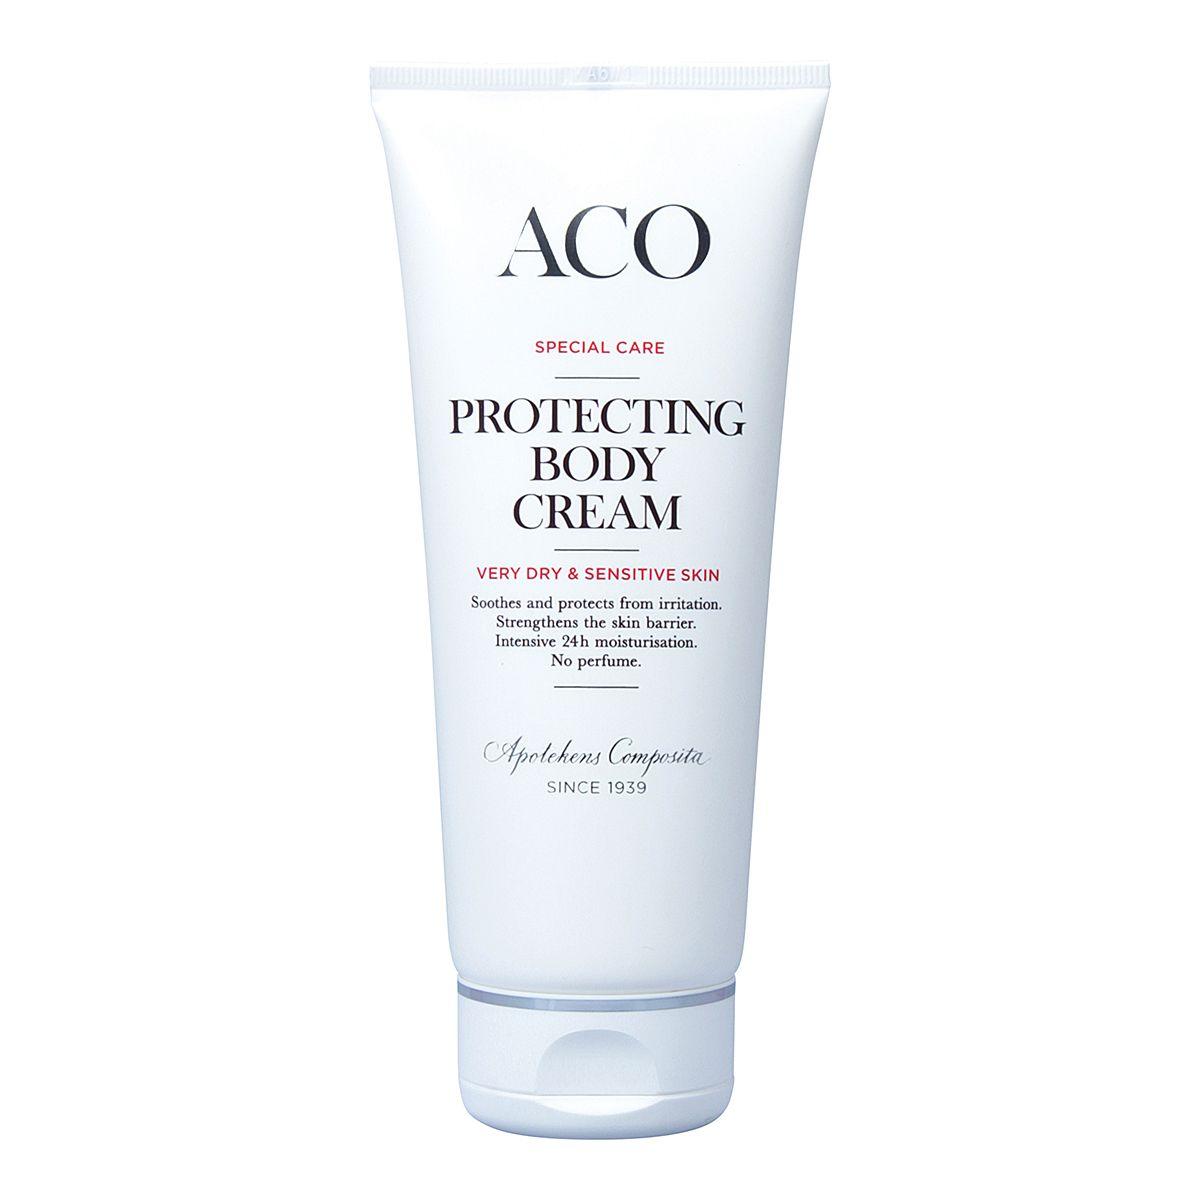 aco body cream